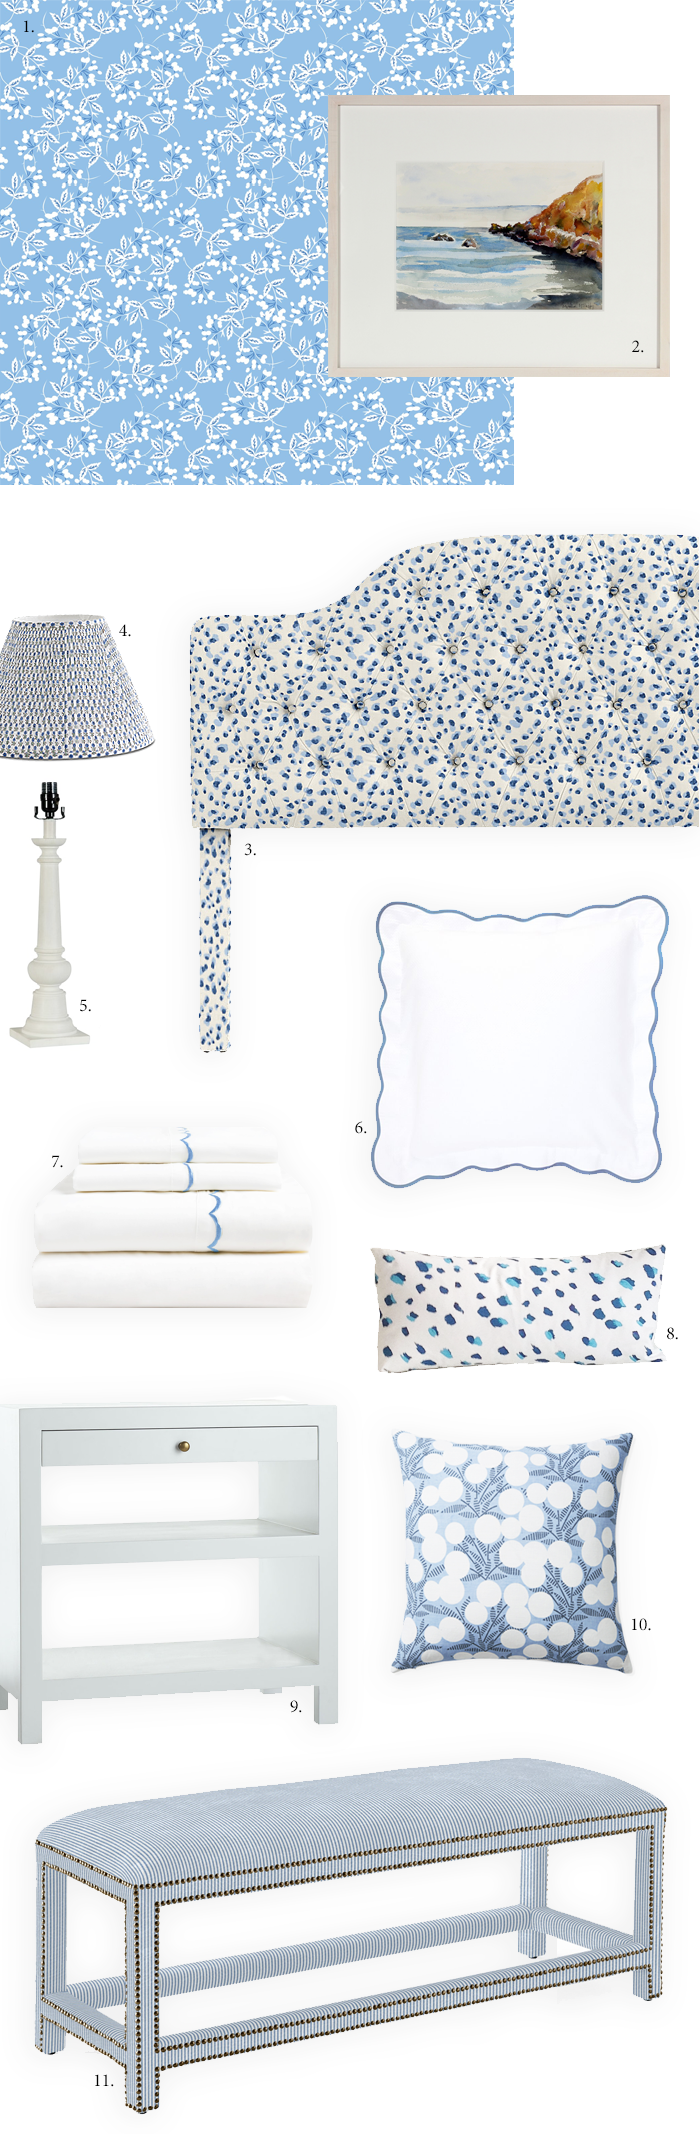 A Dreamy Blue & White Bedroom